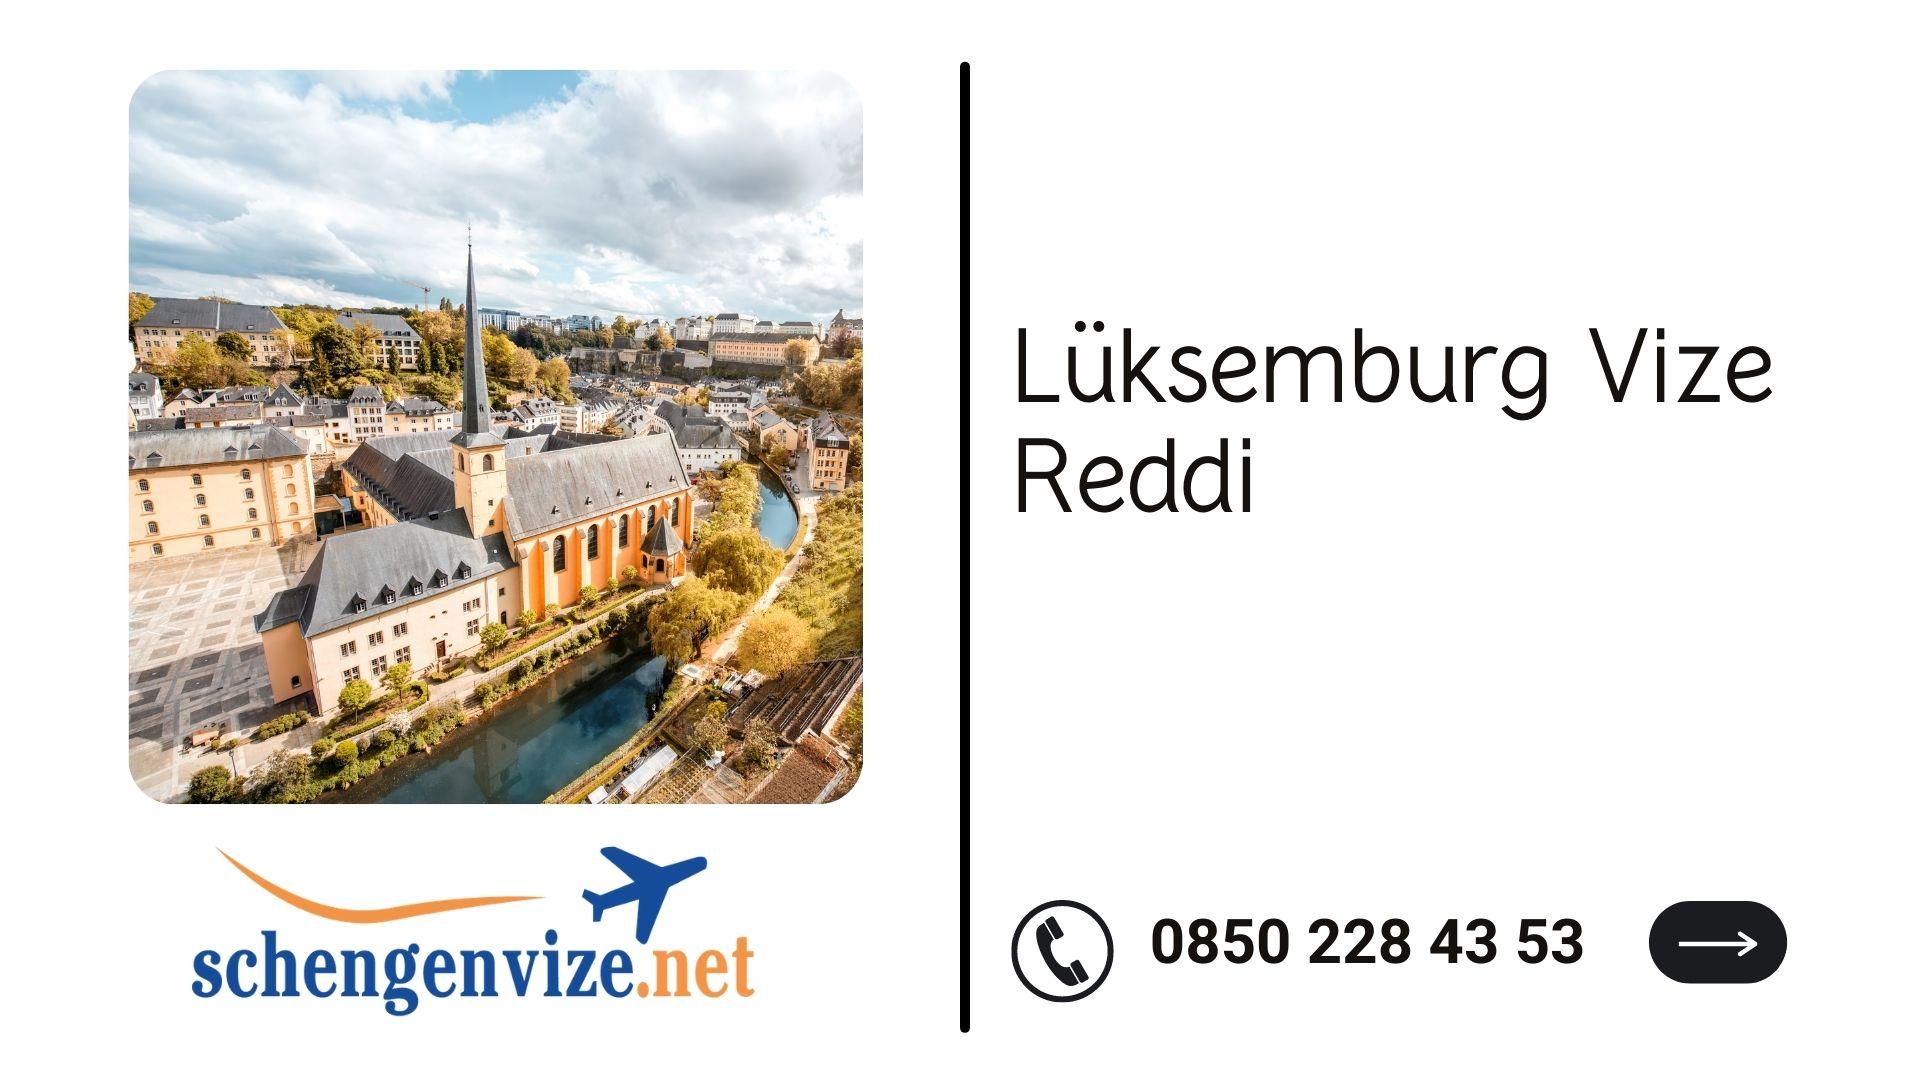 Lüksemburg Vize Reddi